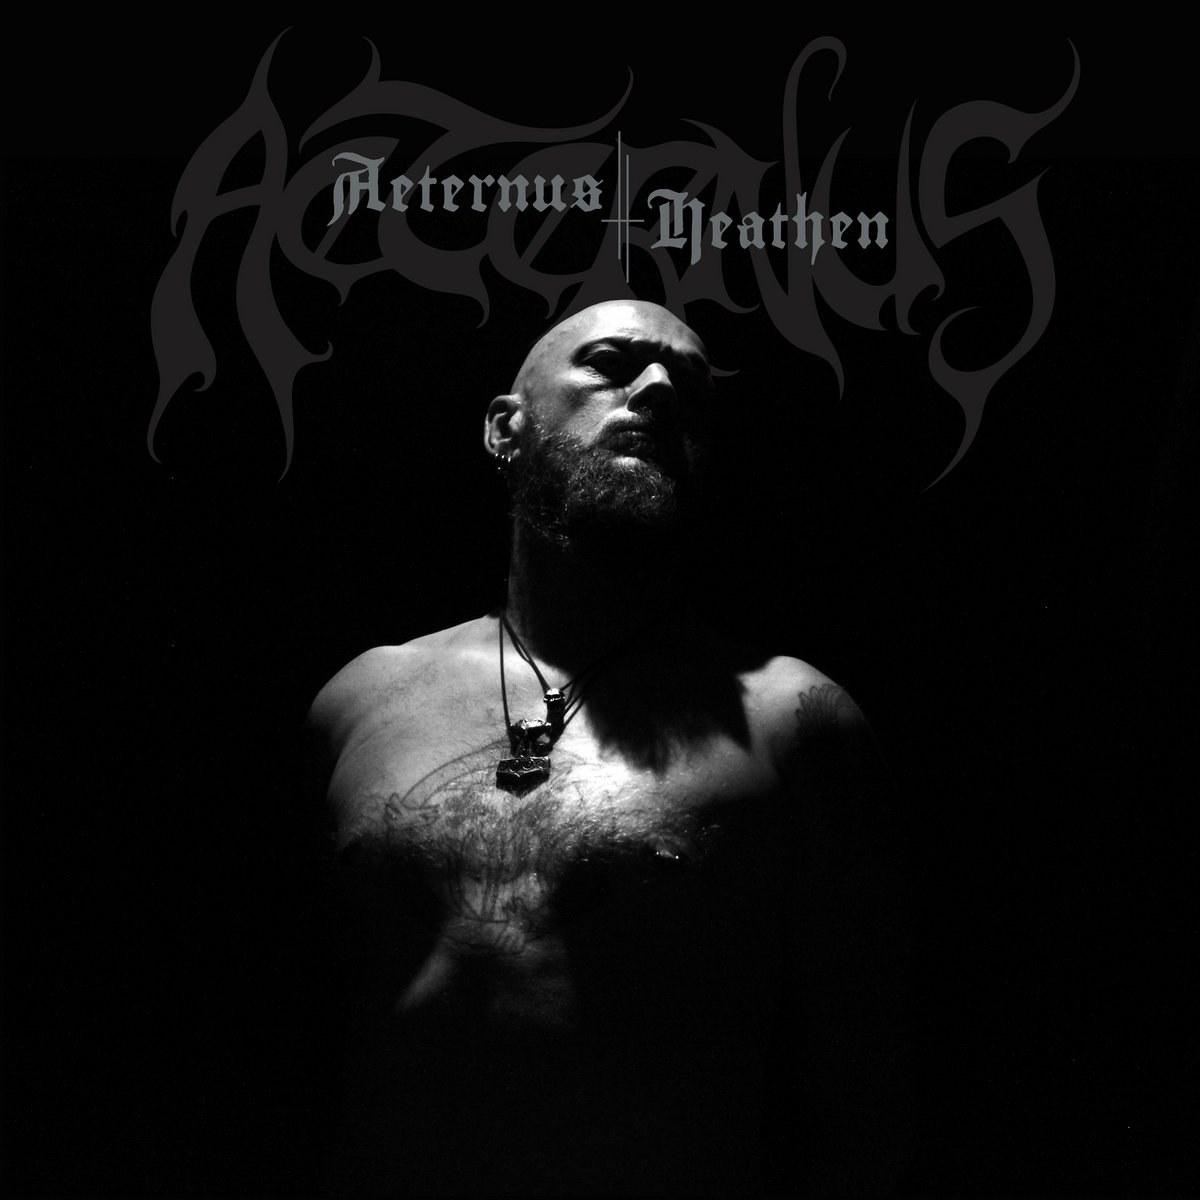 Review for Aeternus - Heathen